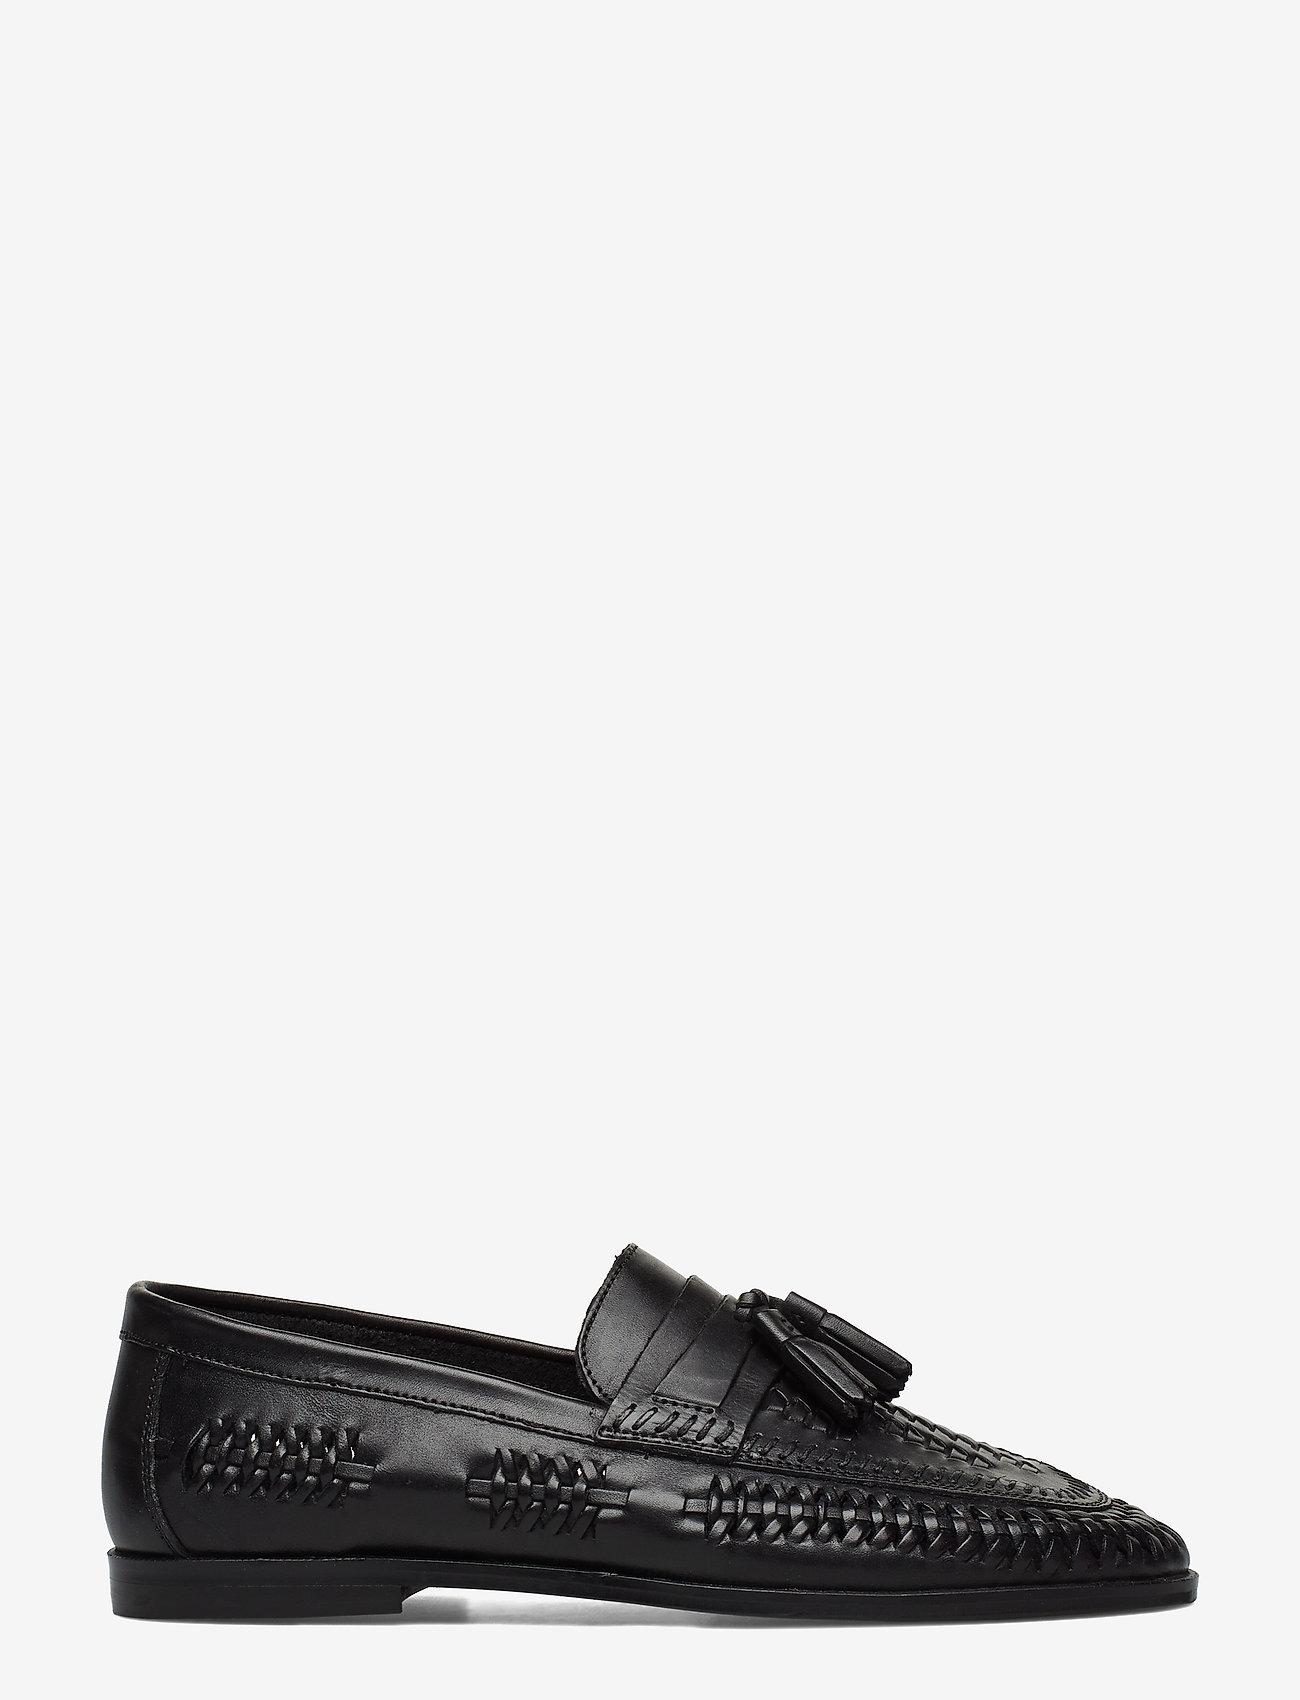 Dune London - Burlingtons - loafers - black - leather - 1